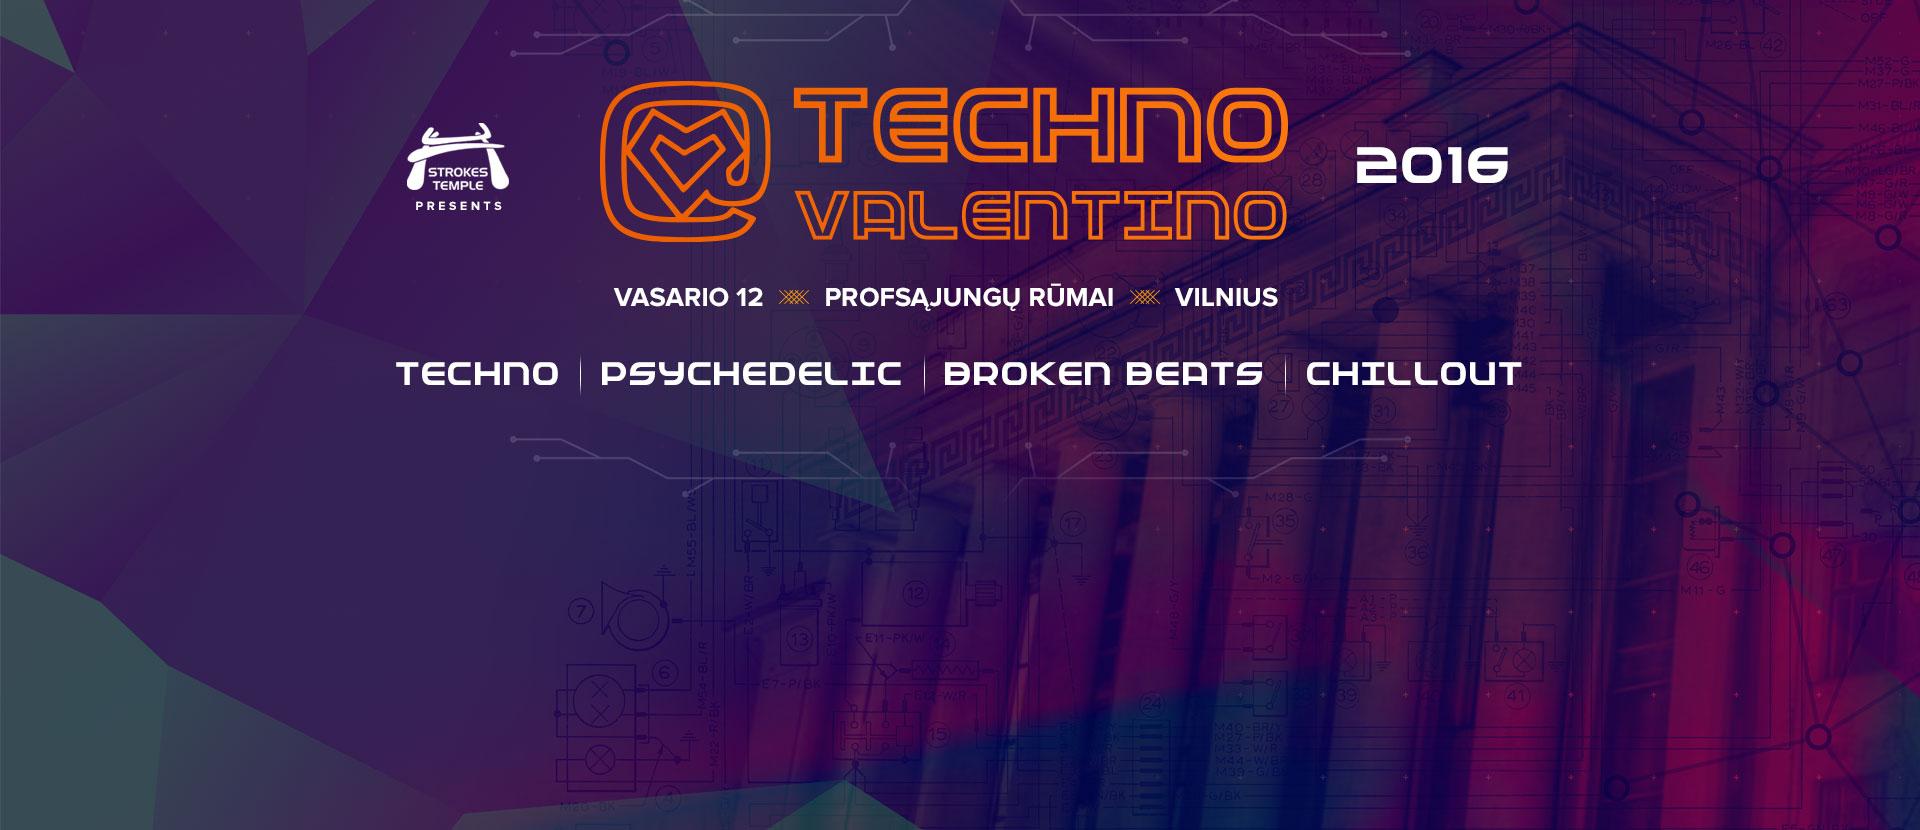 Techno Valentino